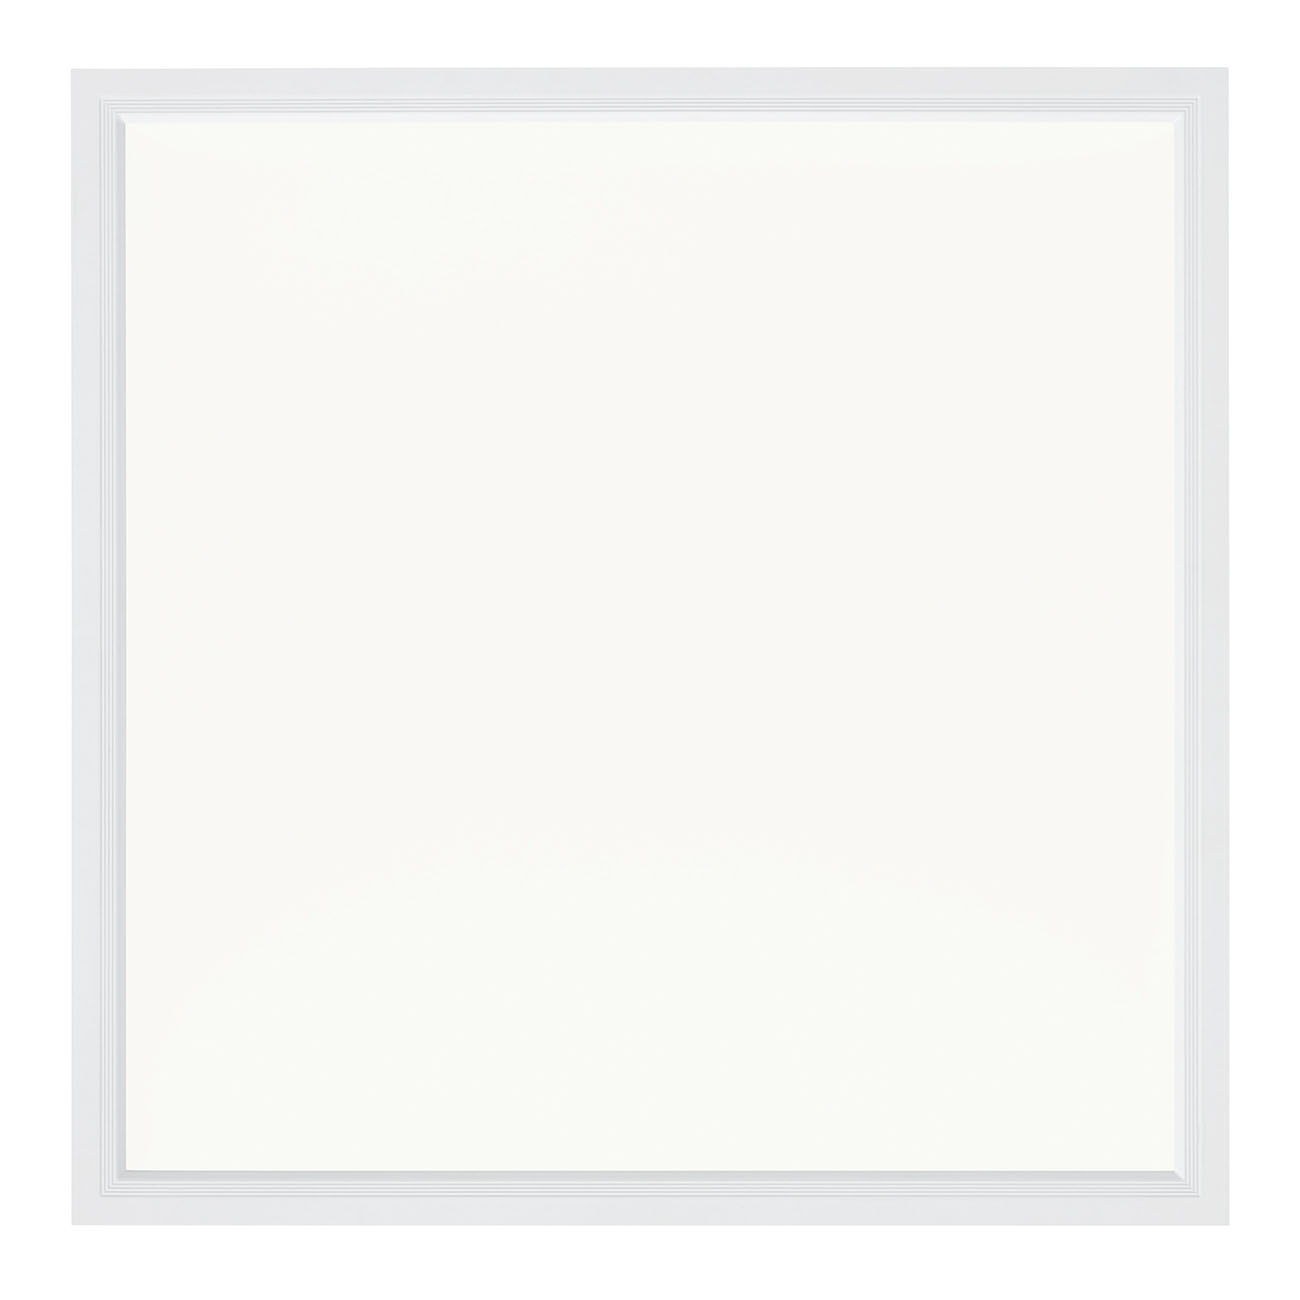 TELEFUNKEN CCT LED Panel, 45 cm, 24 W, Weiss